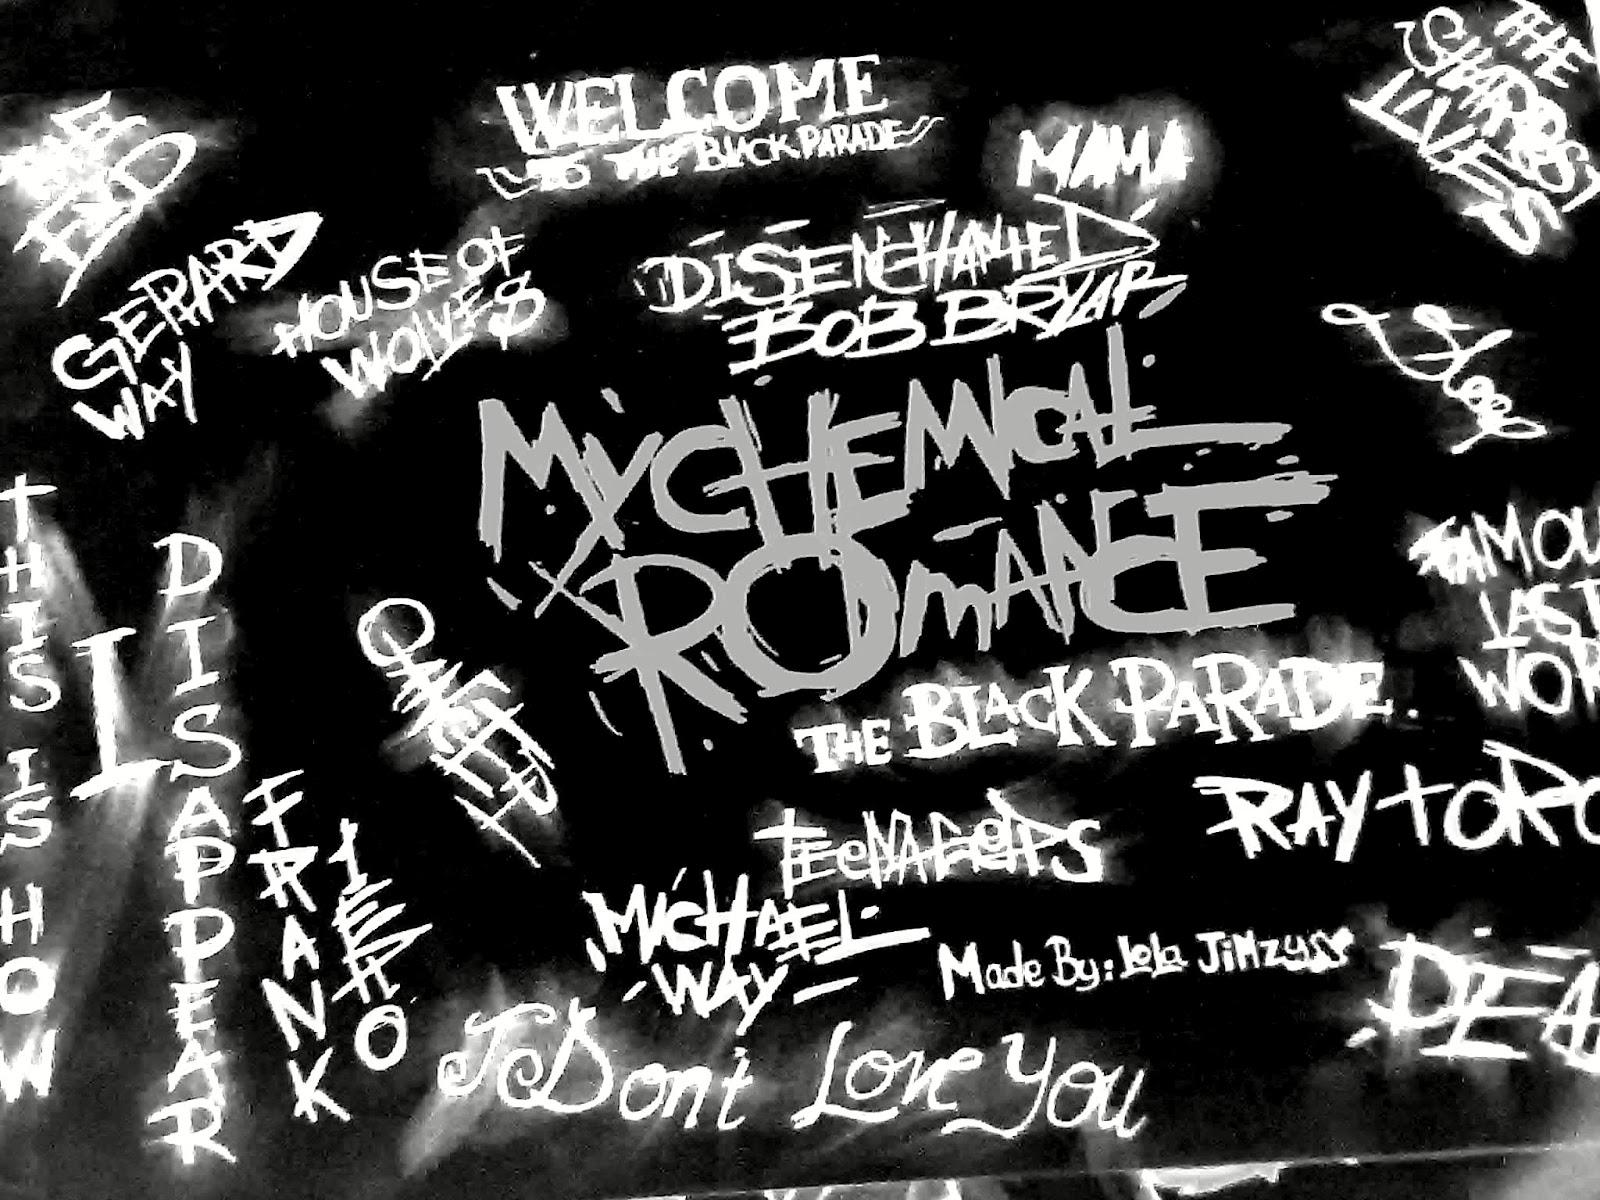 School of rock randolph presents: my chemical romance stanhope.